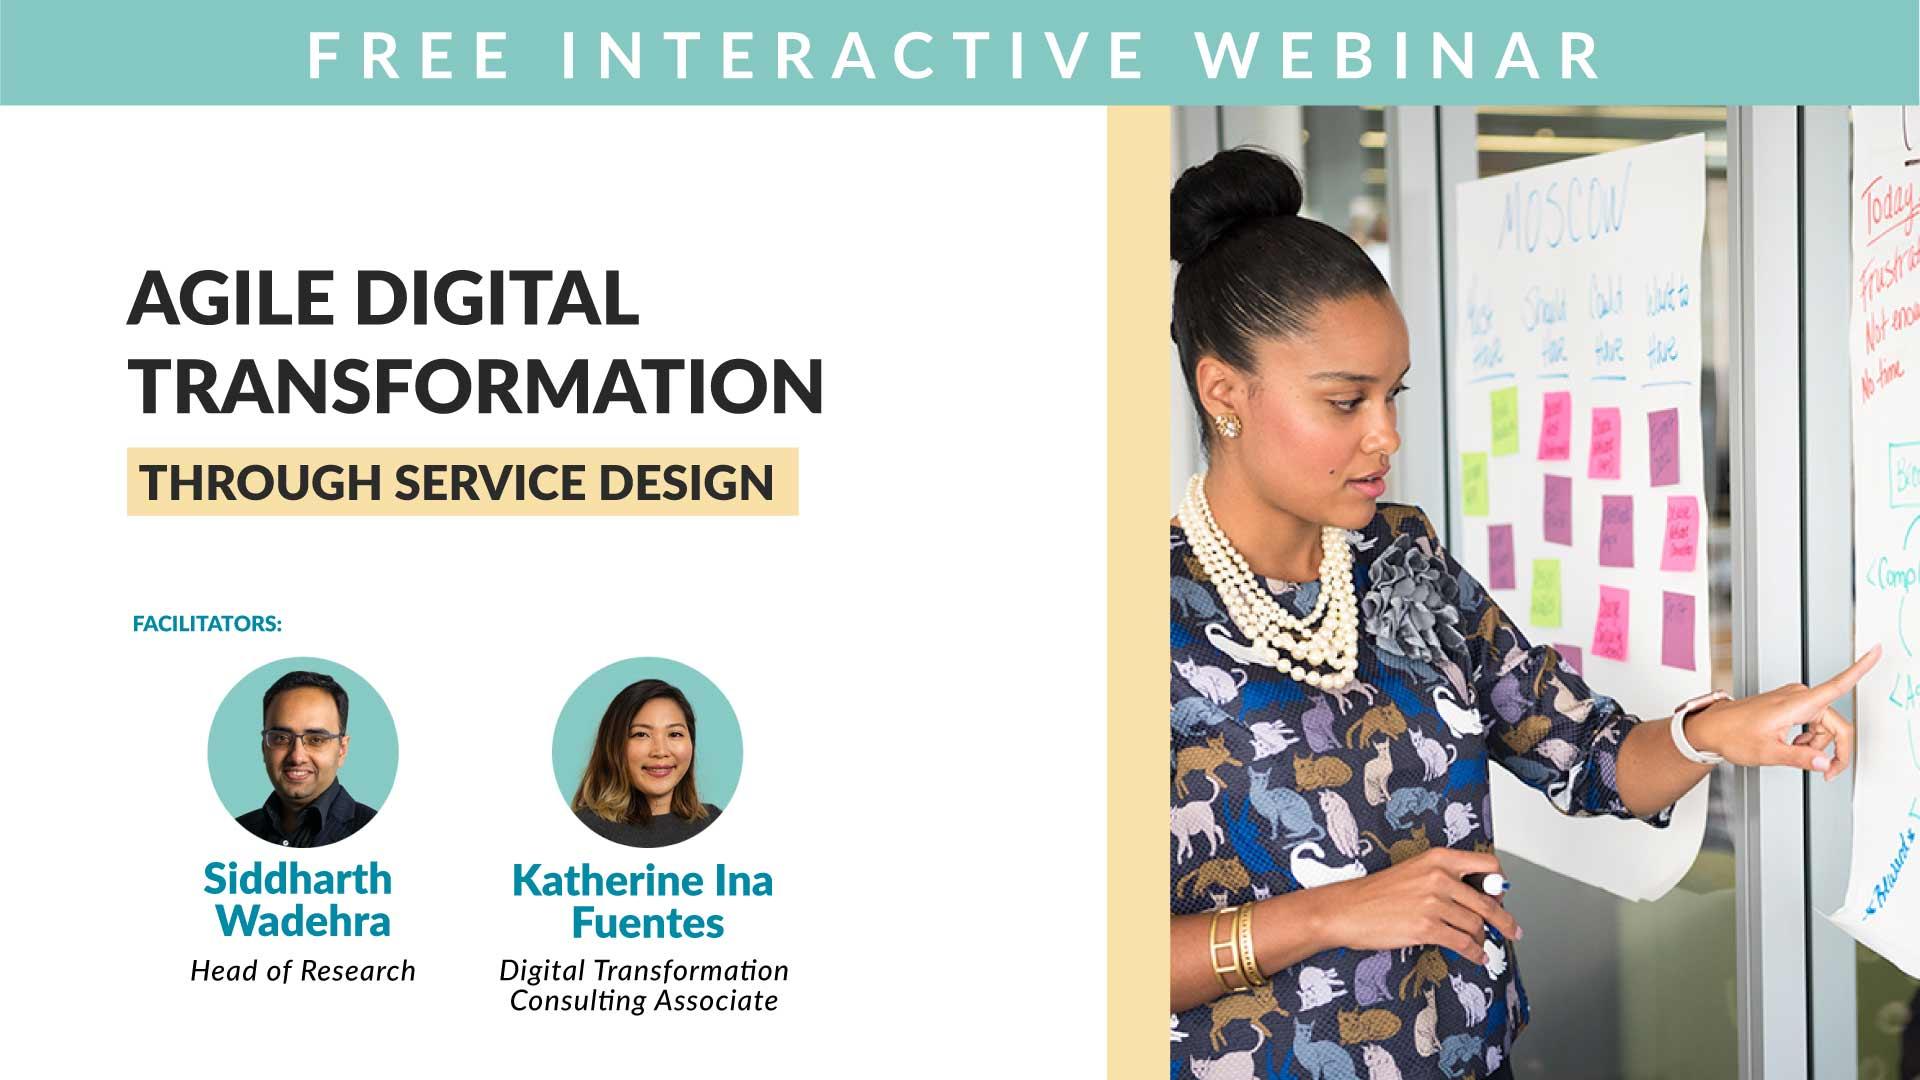 Agile-Digital-Transformation-Through-Service-Design